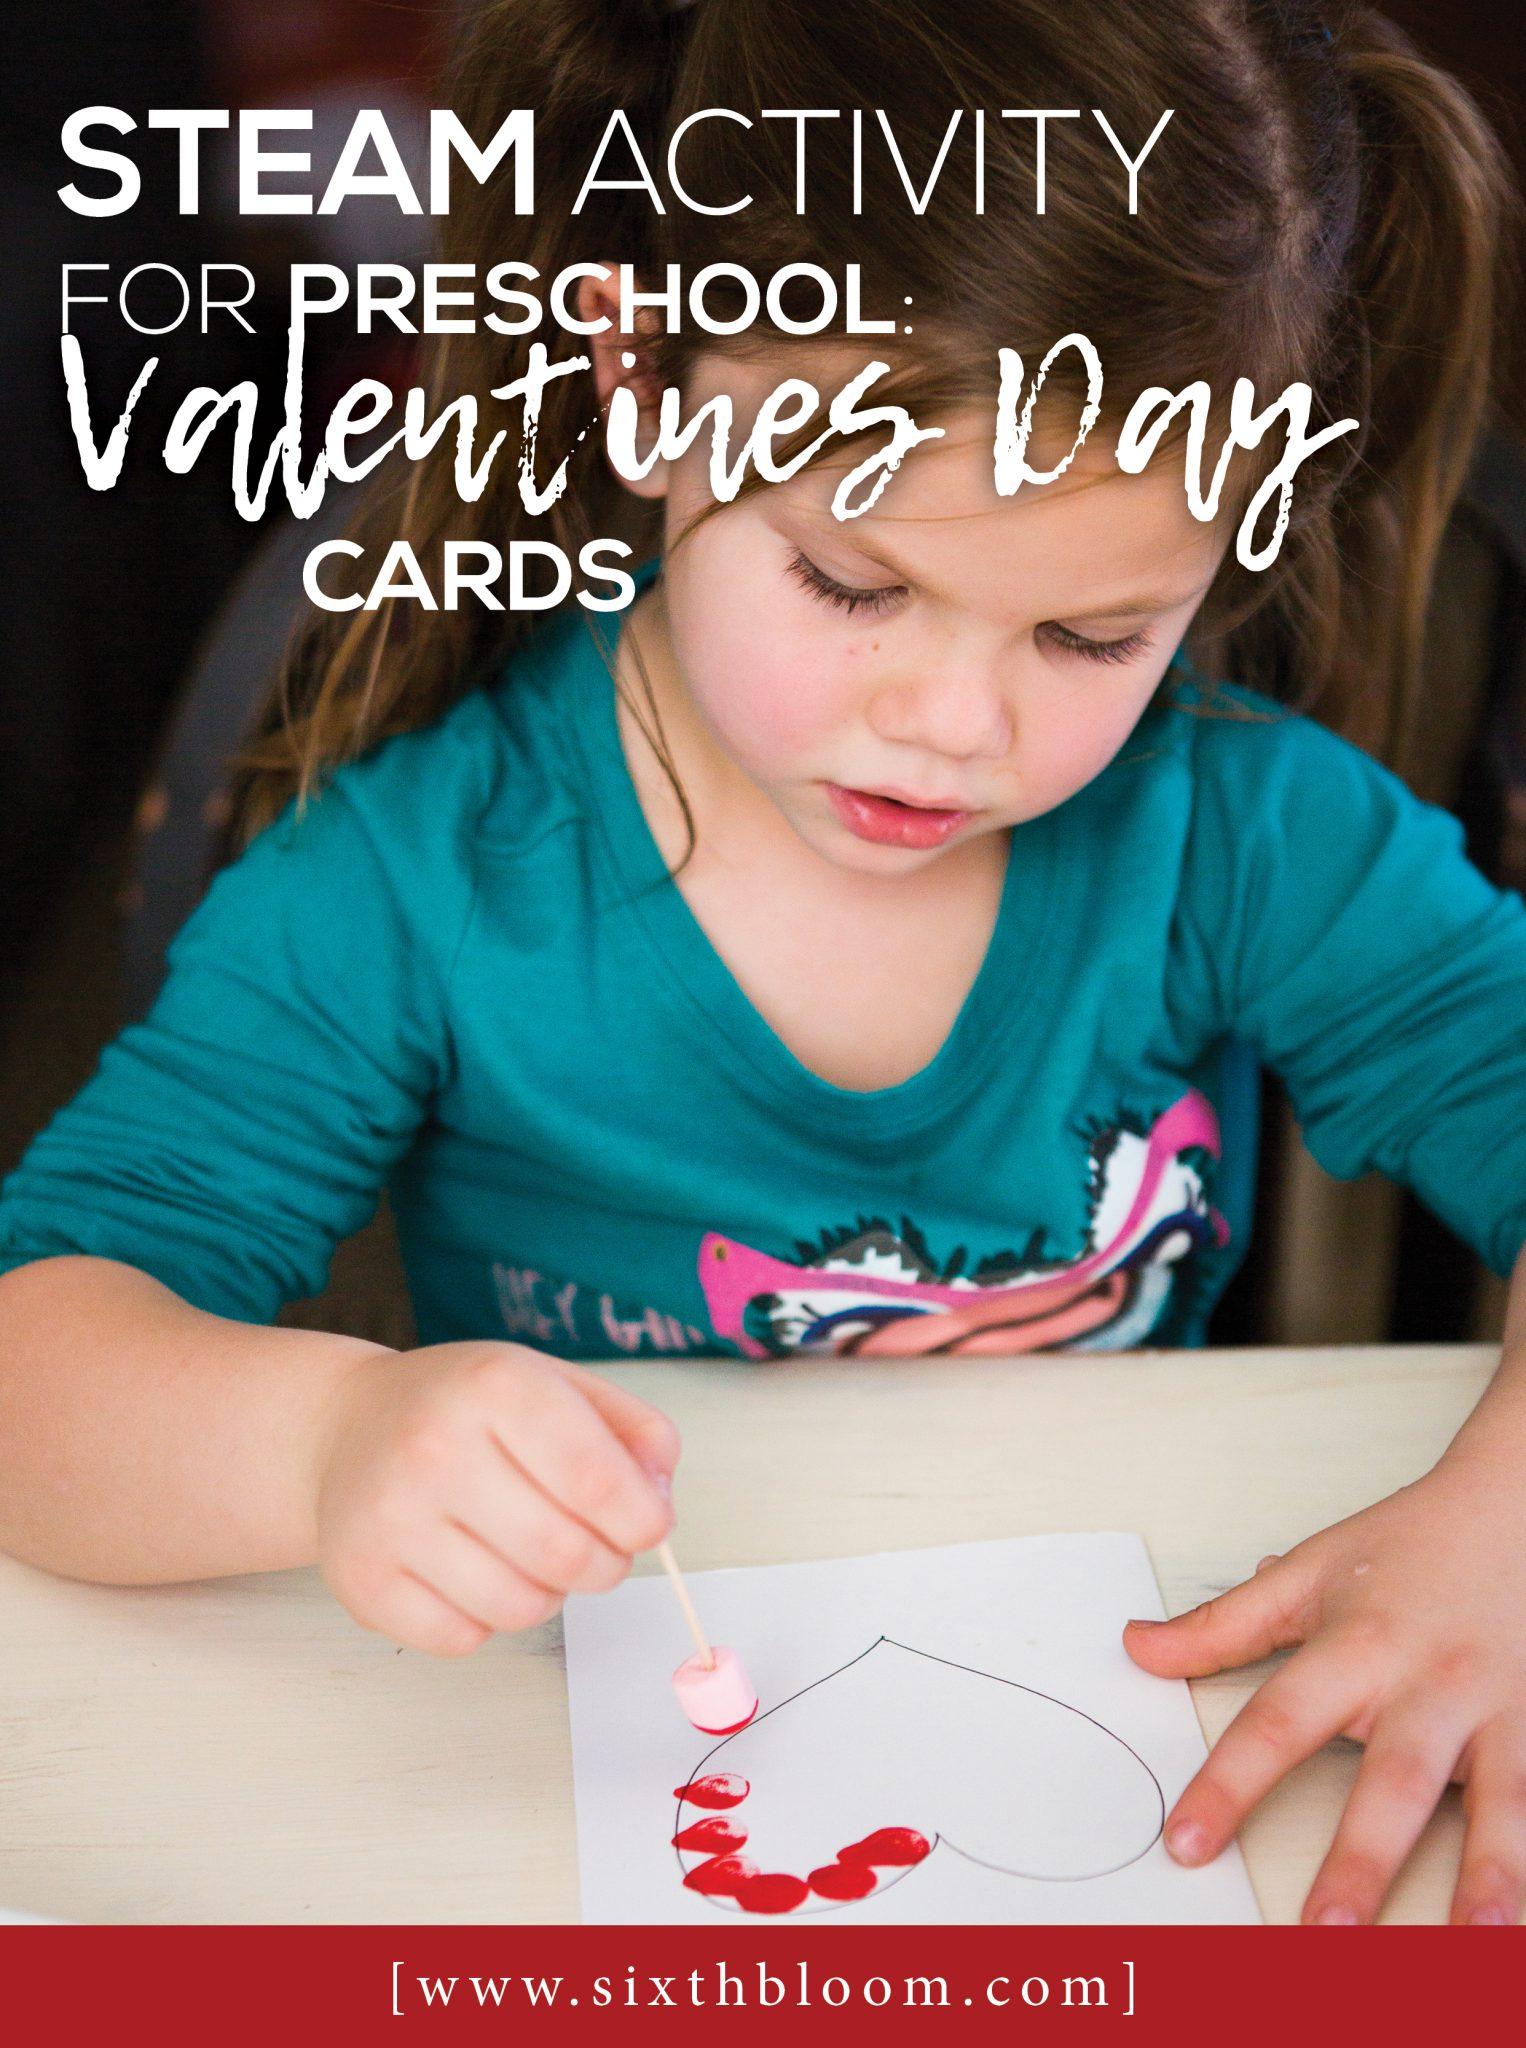 Steam Activities For Preschoolers Valentines Day Cards